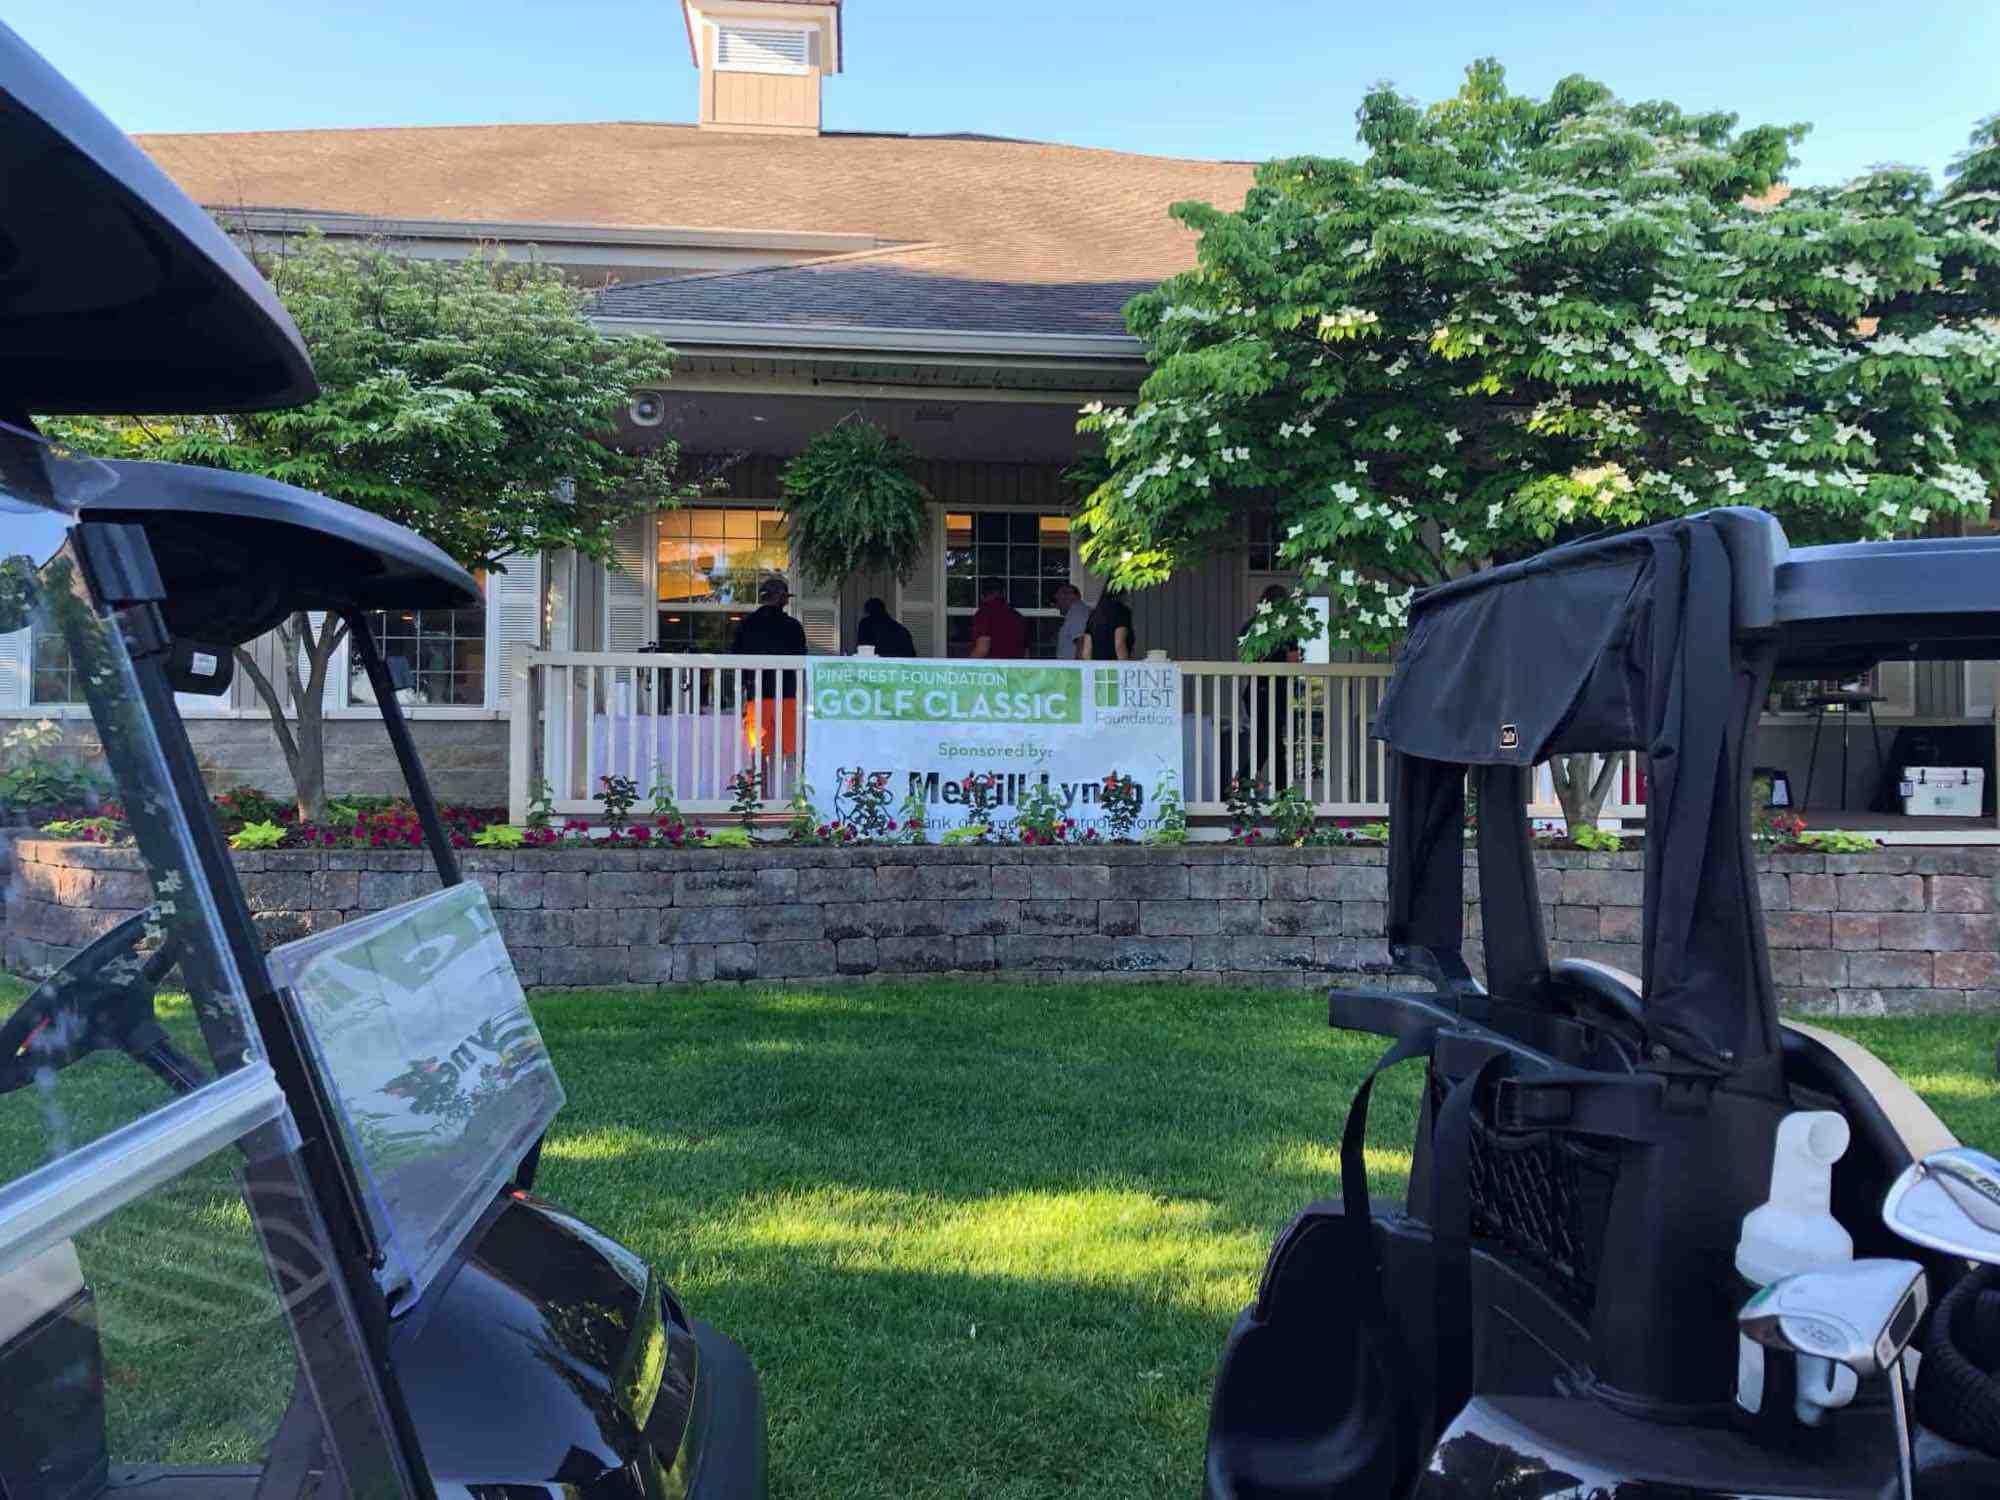 GOLF CLASSIC 2018: Golf Classic Sign